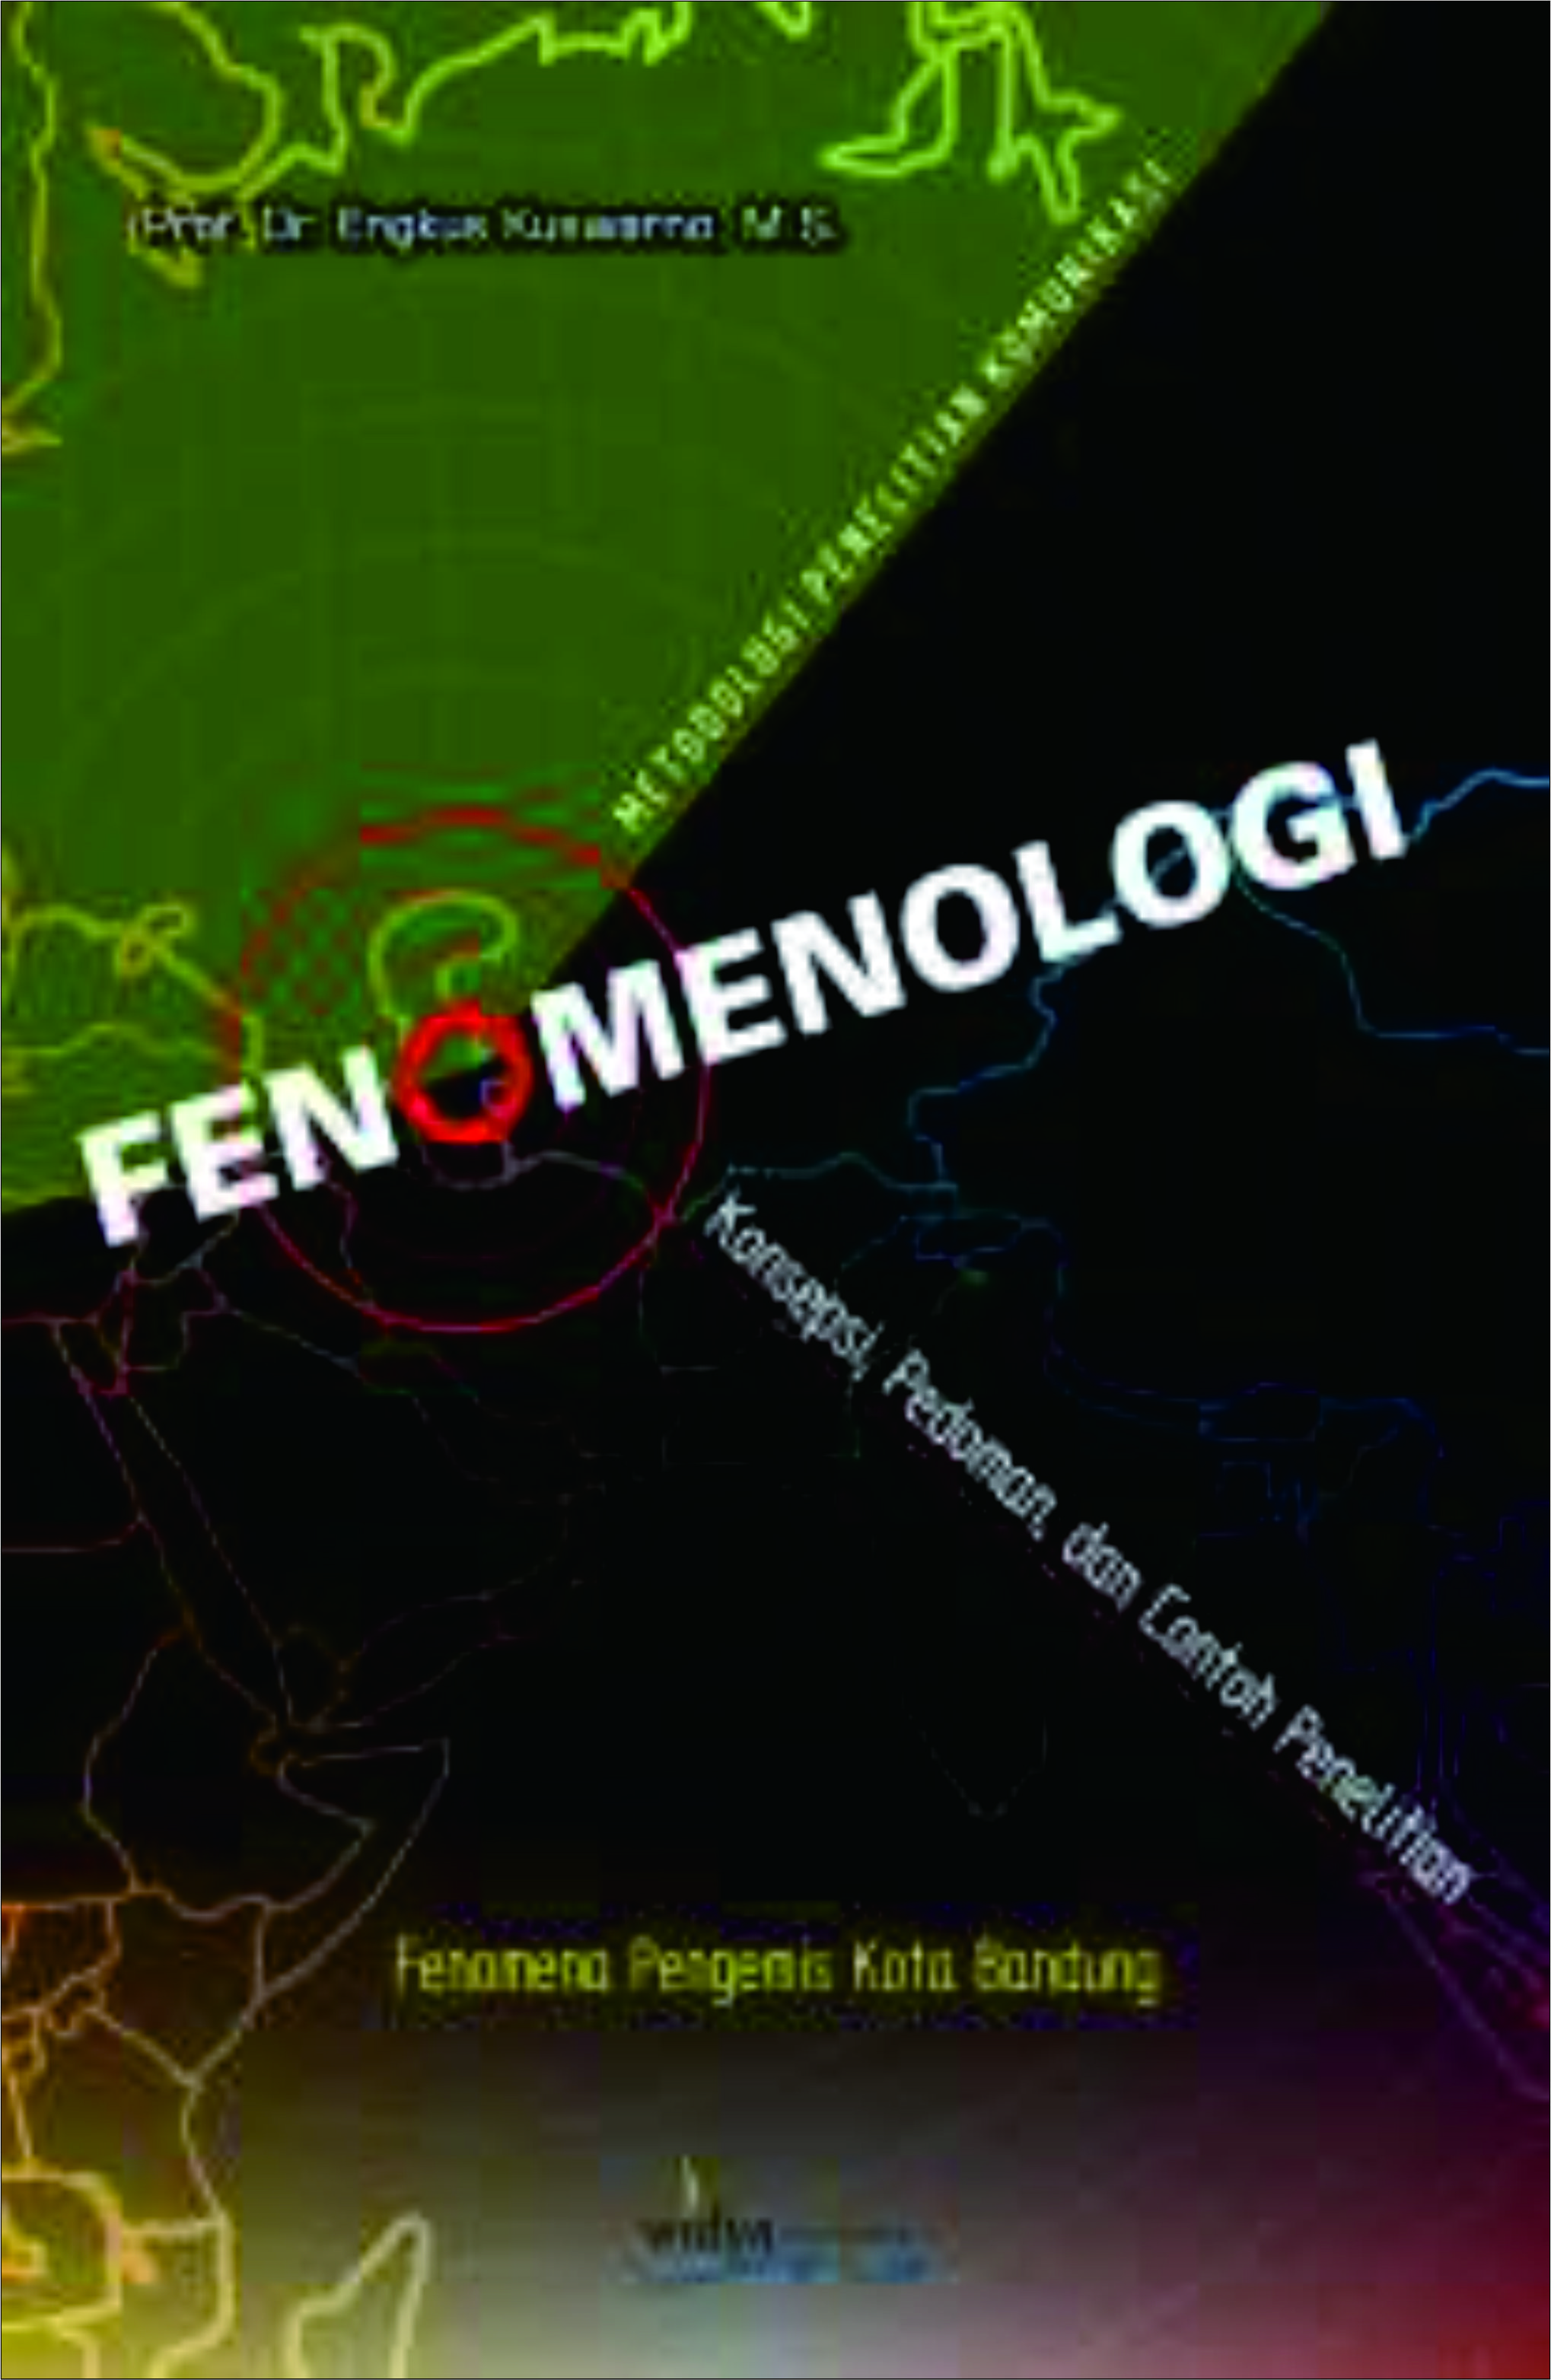 Fenomenologi Metodologi Penelitian Komunikasi Universitas Padjadjaran